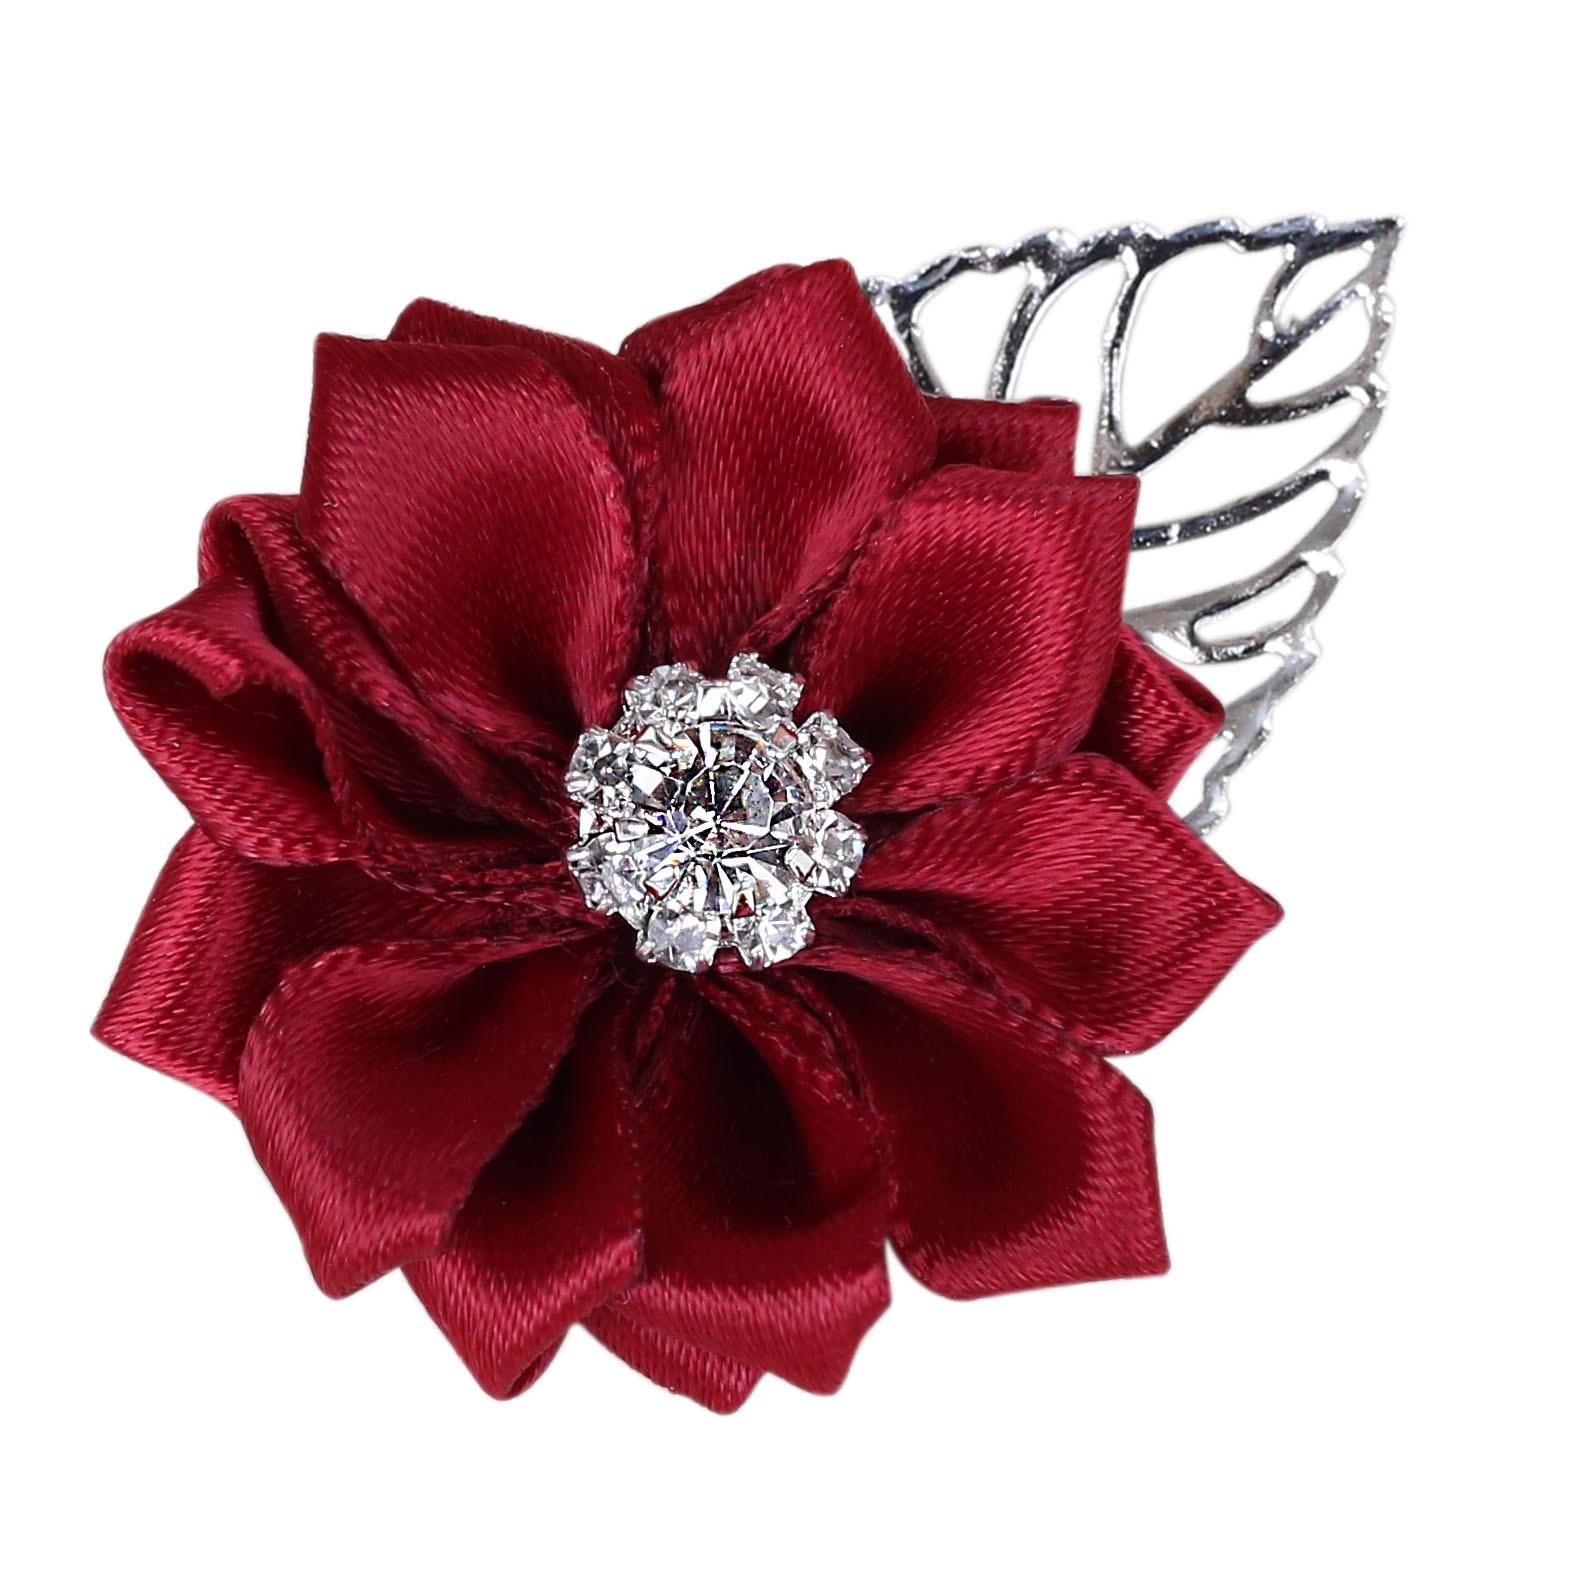 Burgundy Artificial Flower Crystal Boutonniere Best Men Wedding Customizable Groomsmen Bridesmaid Wedding Prom Corsage XH037